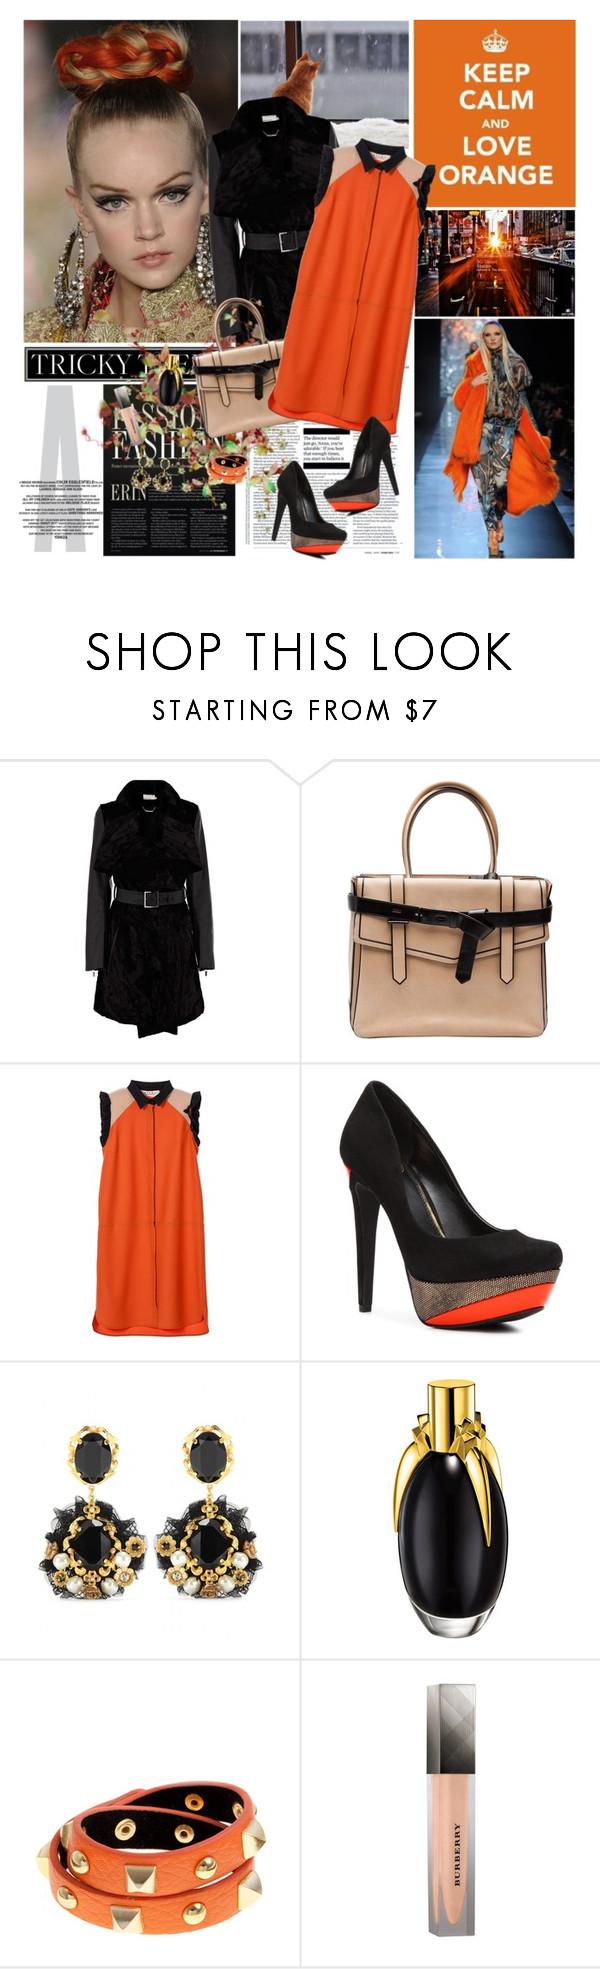 Trend black and orange